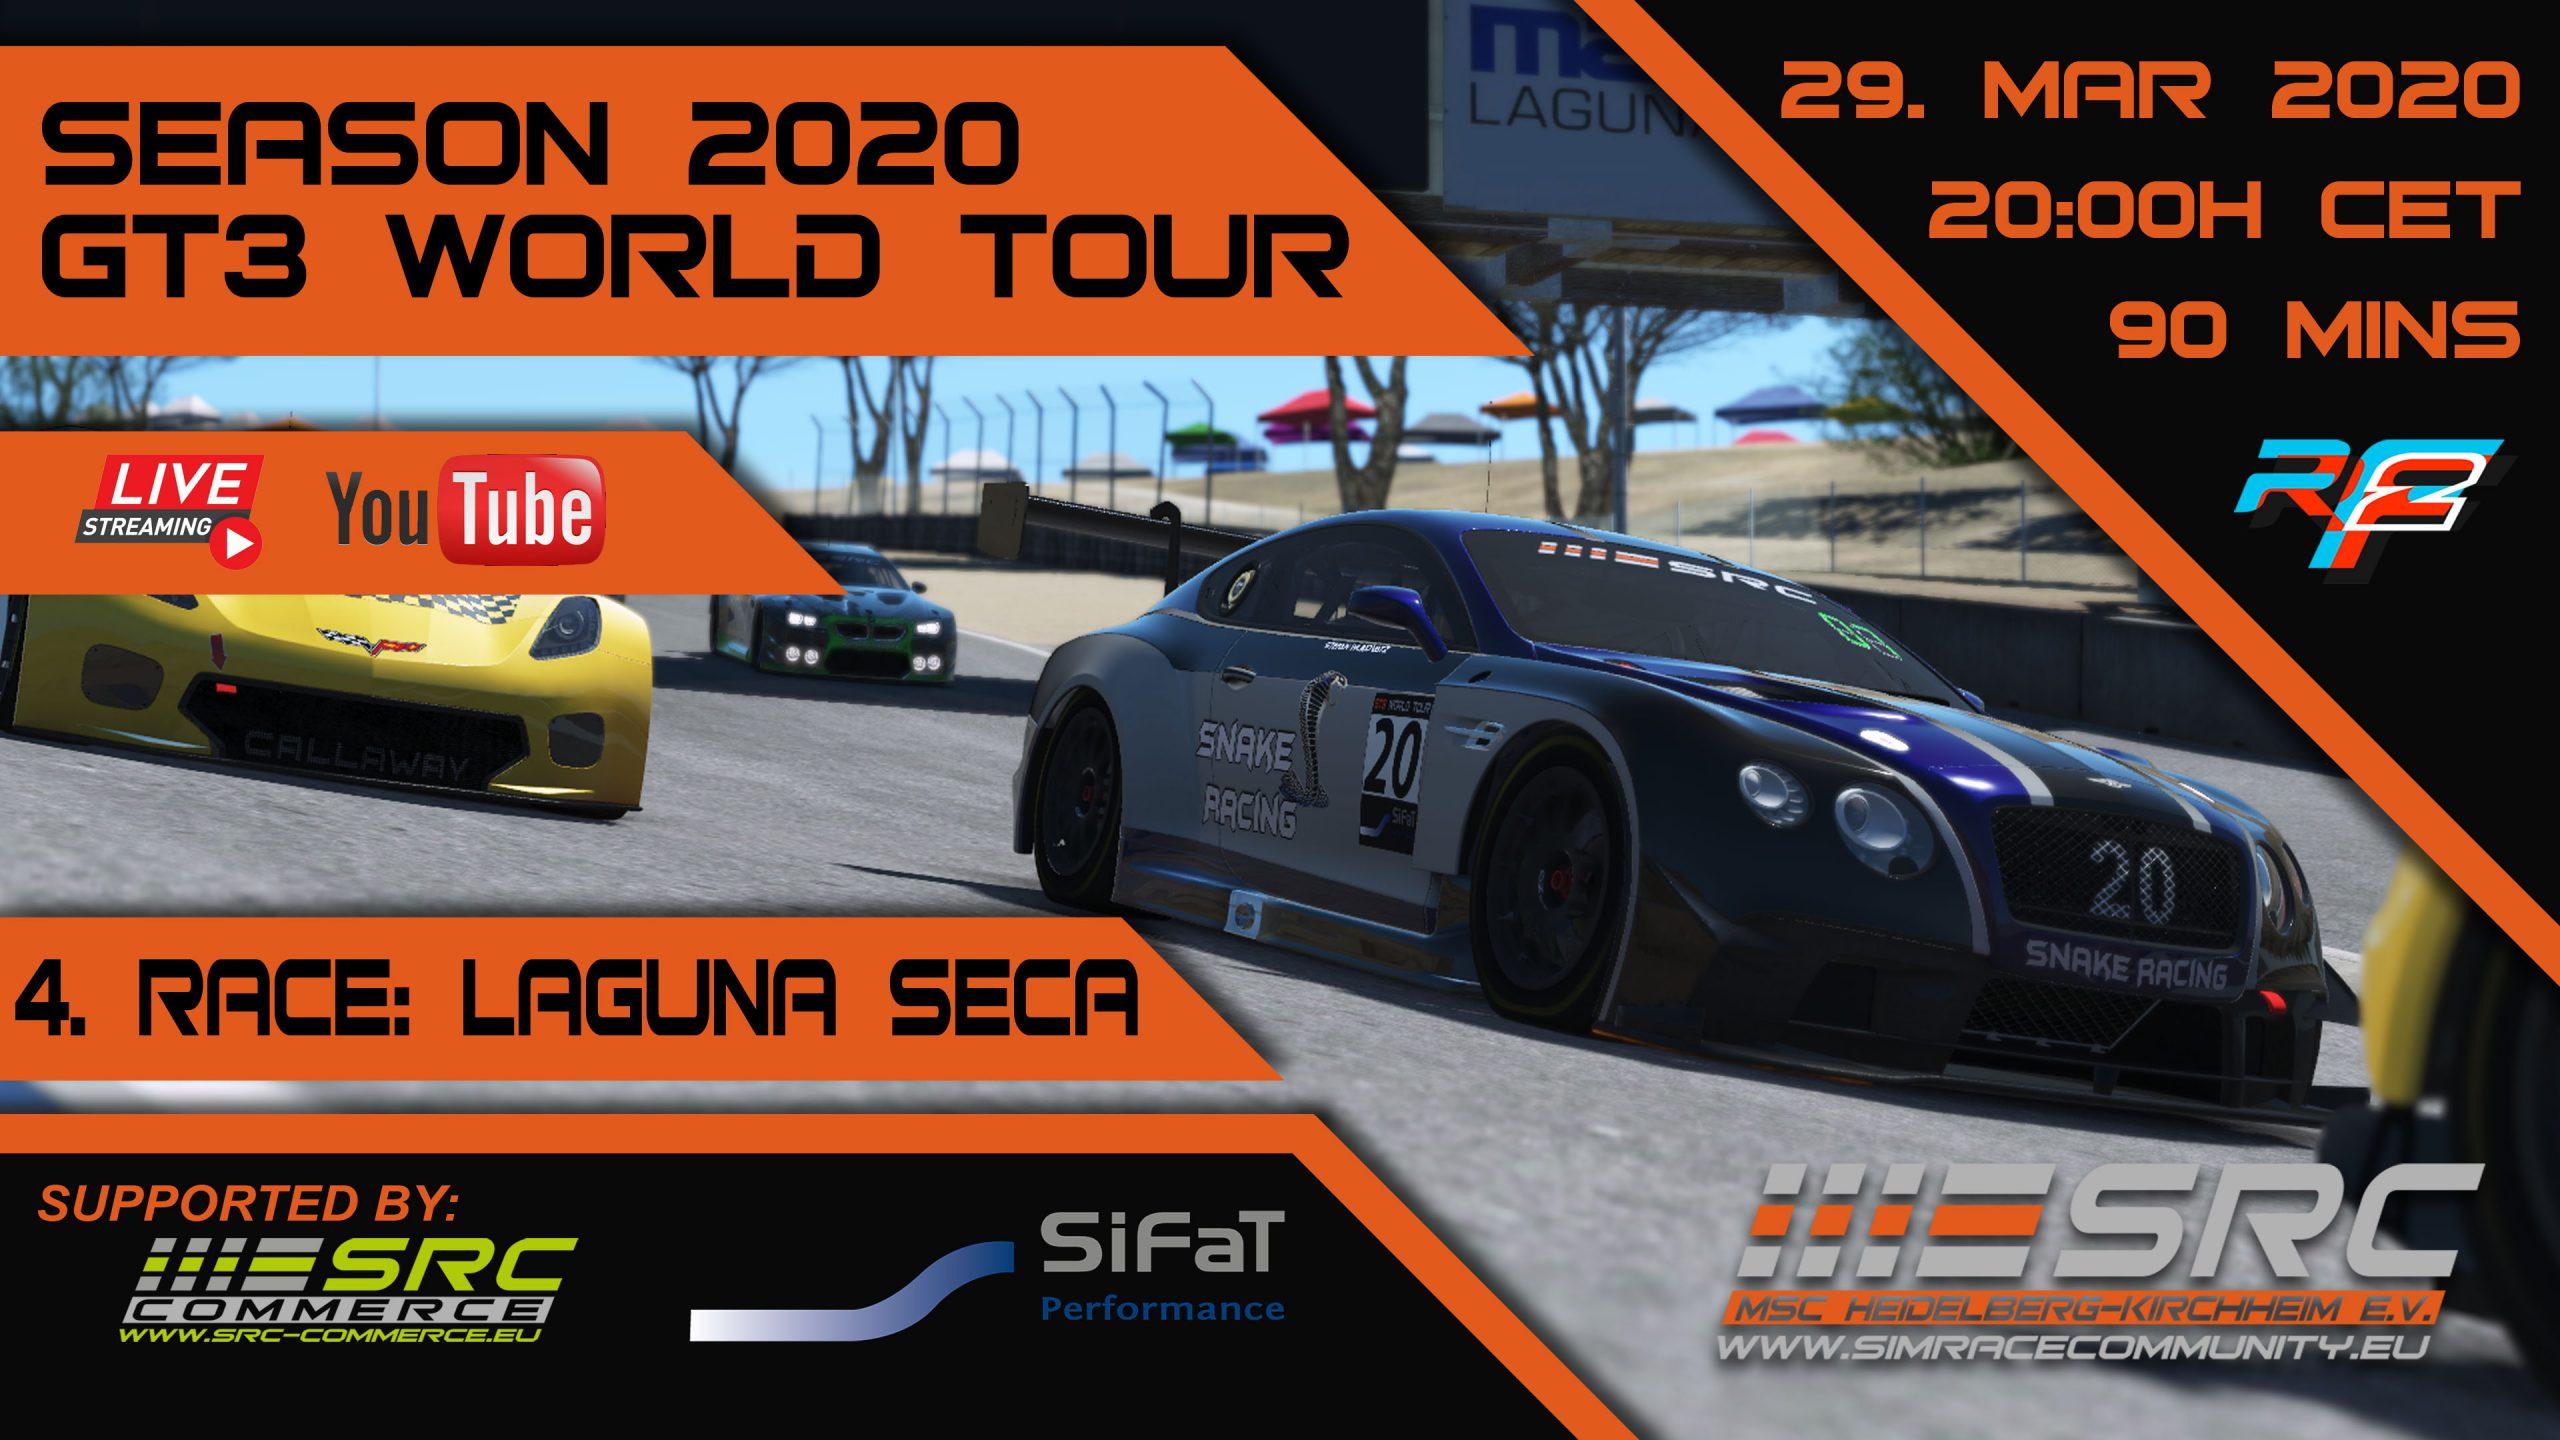 SimRacing GT3 World Tour, Simulation, Community, Laguna Seca